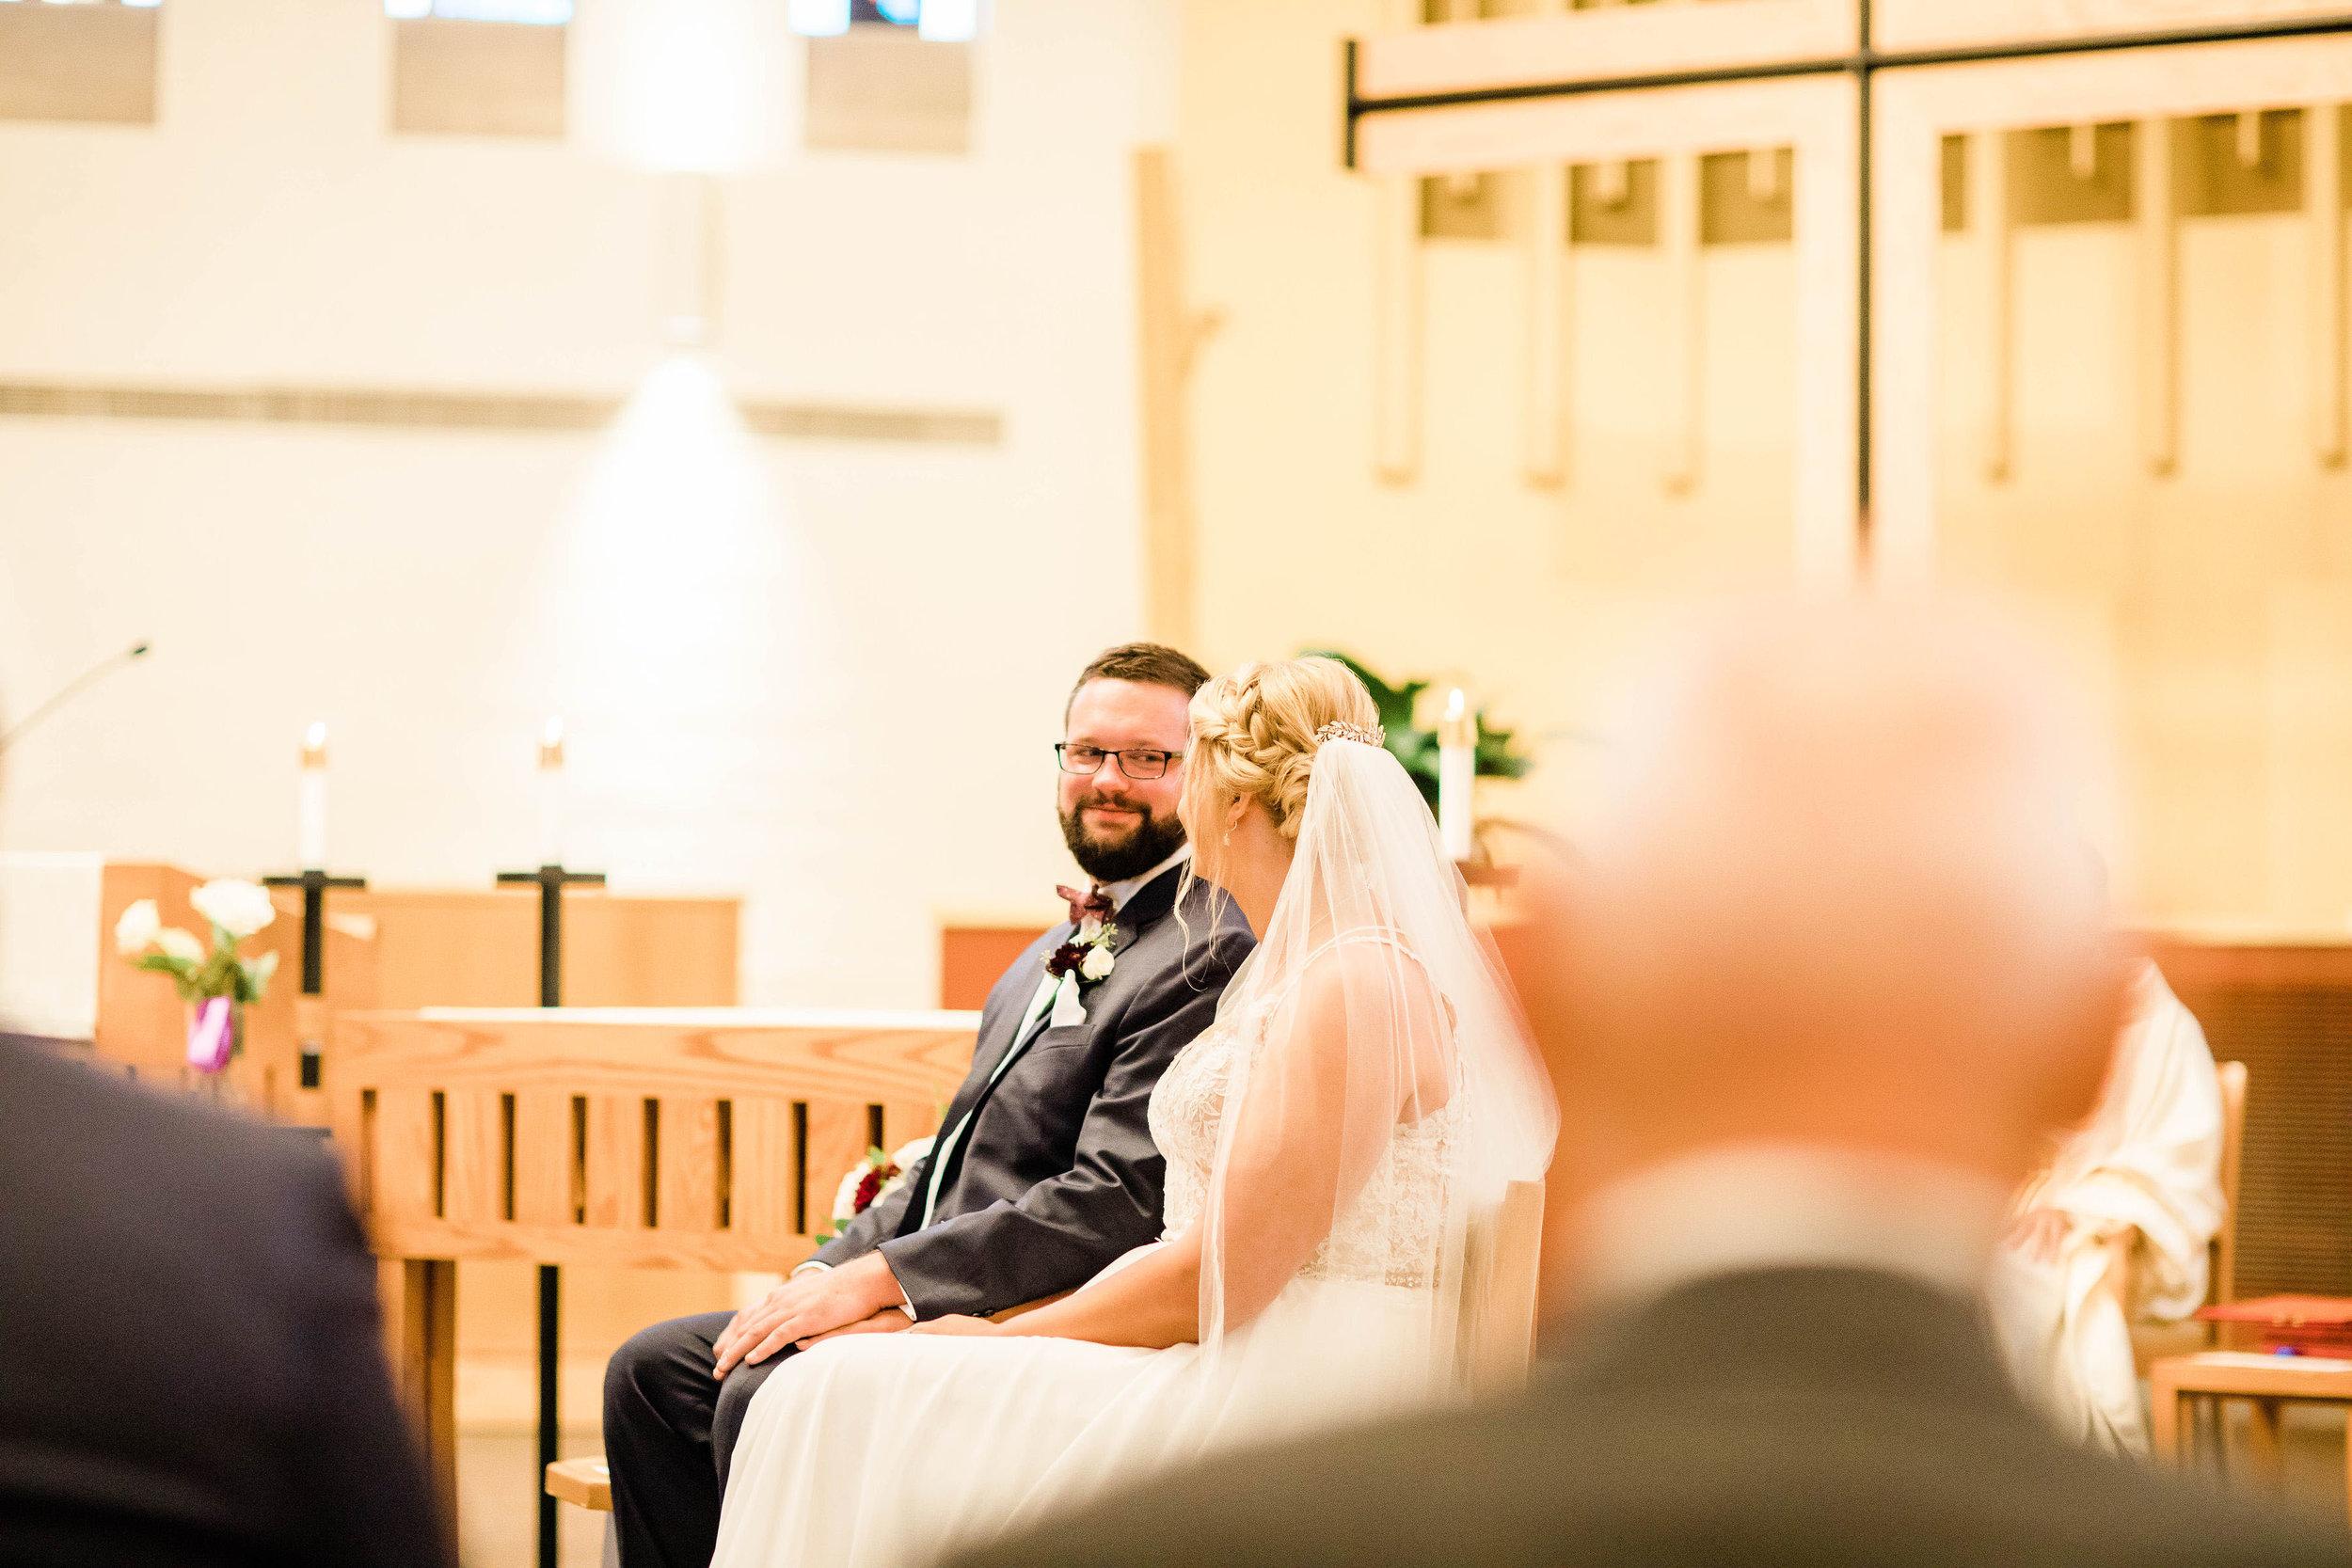 bellarmine chapel wedding ceremony-3.jpg